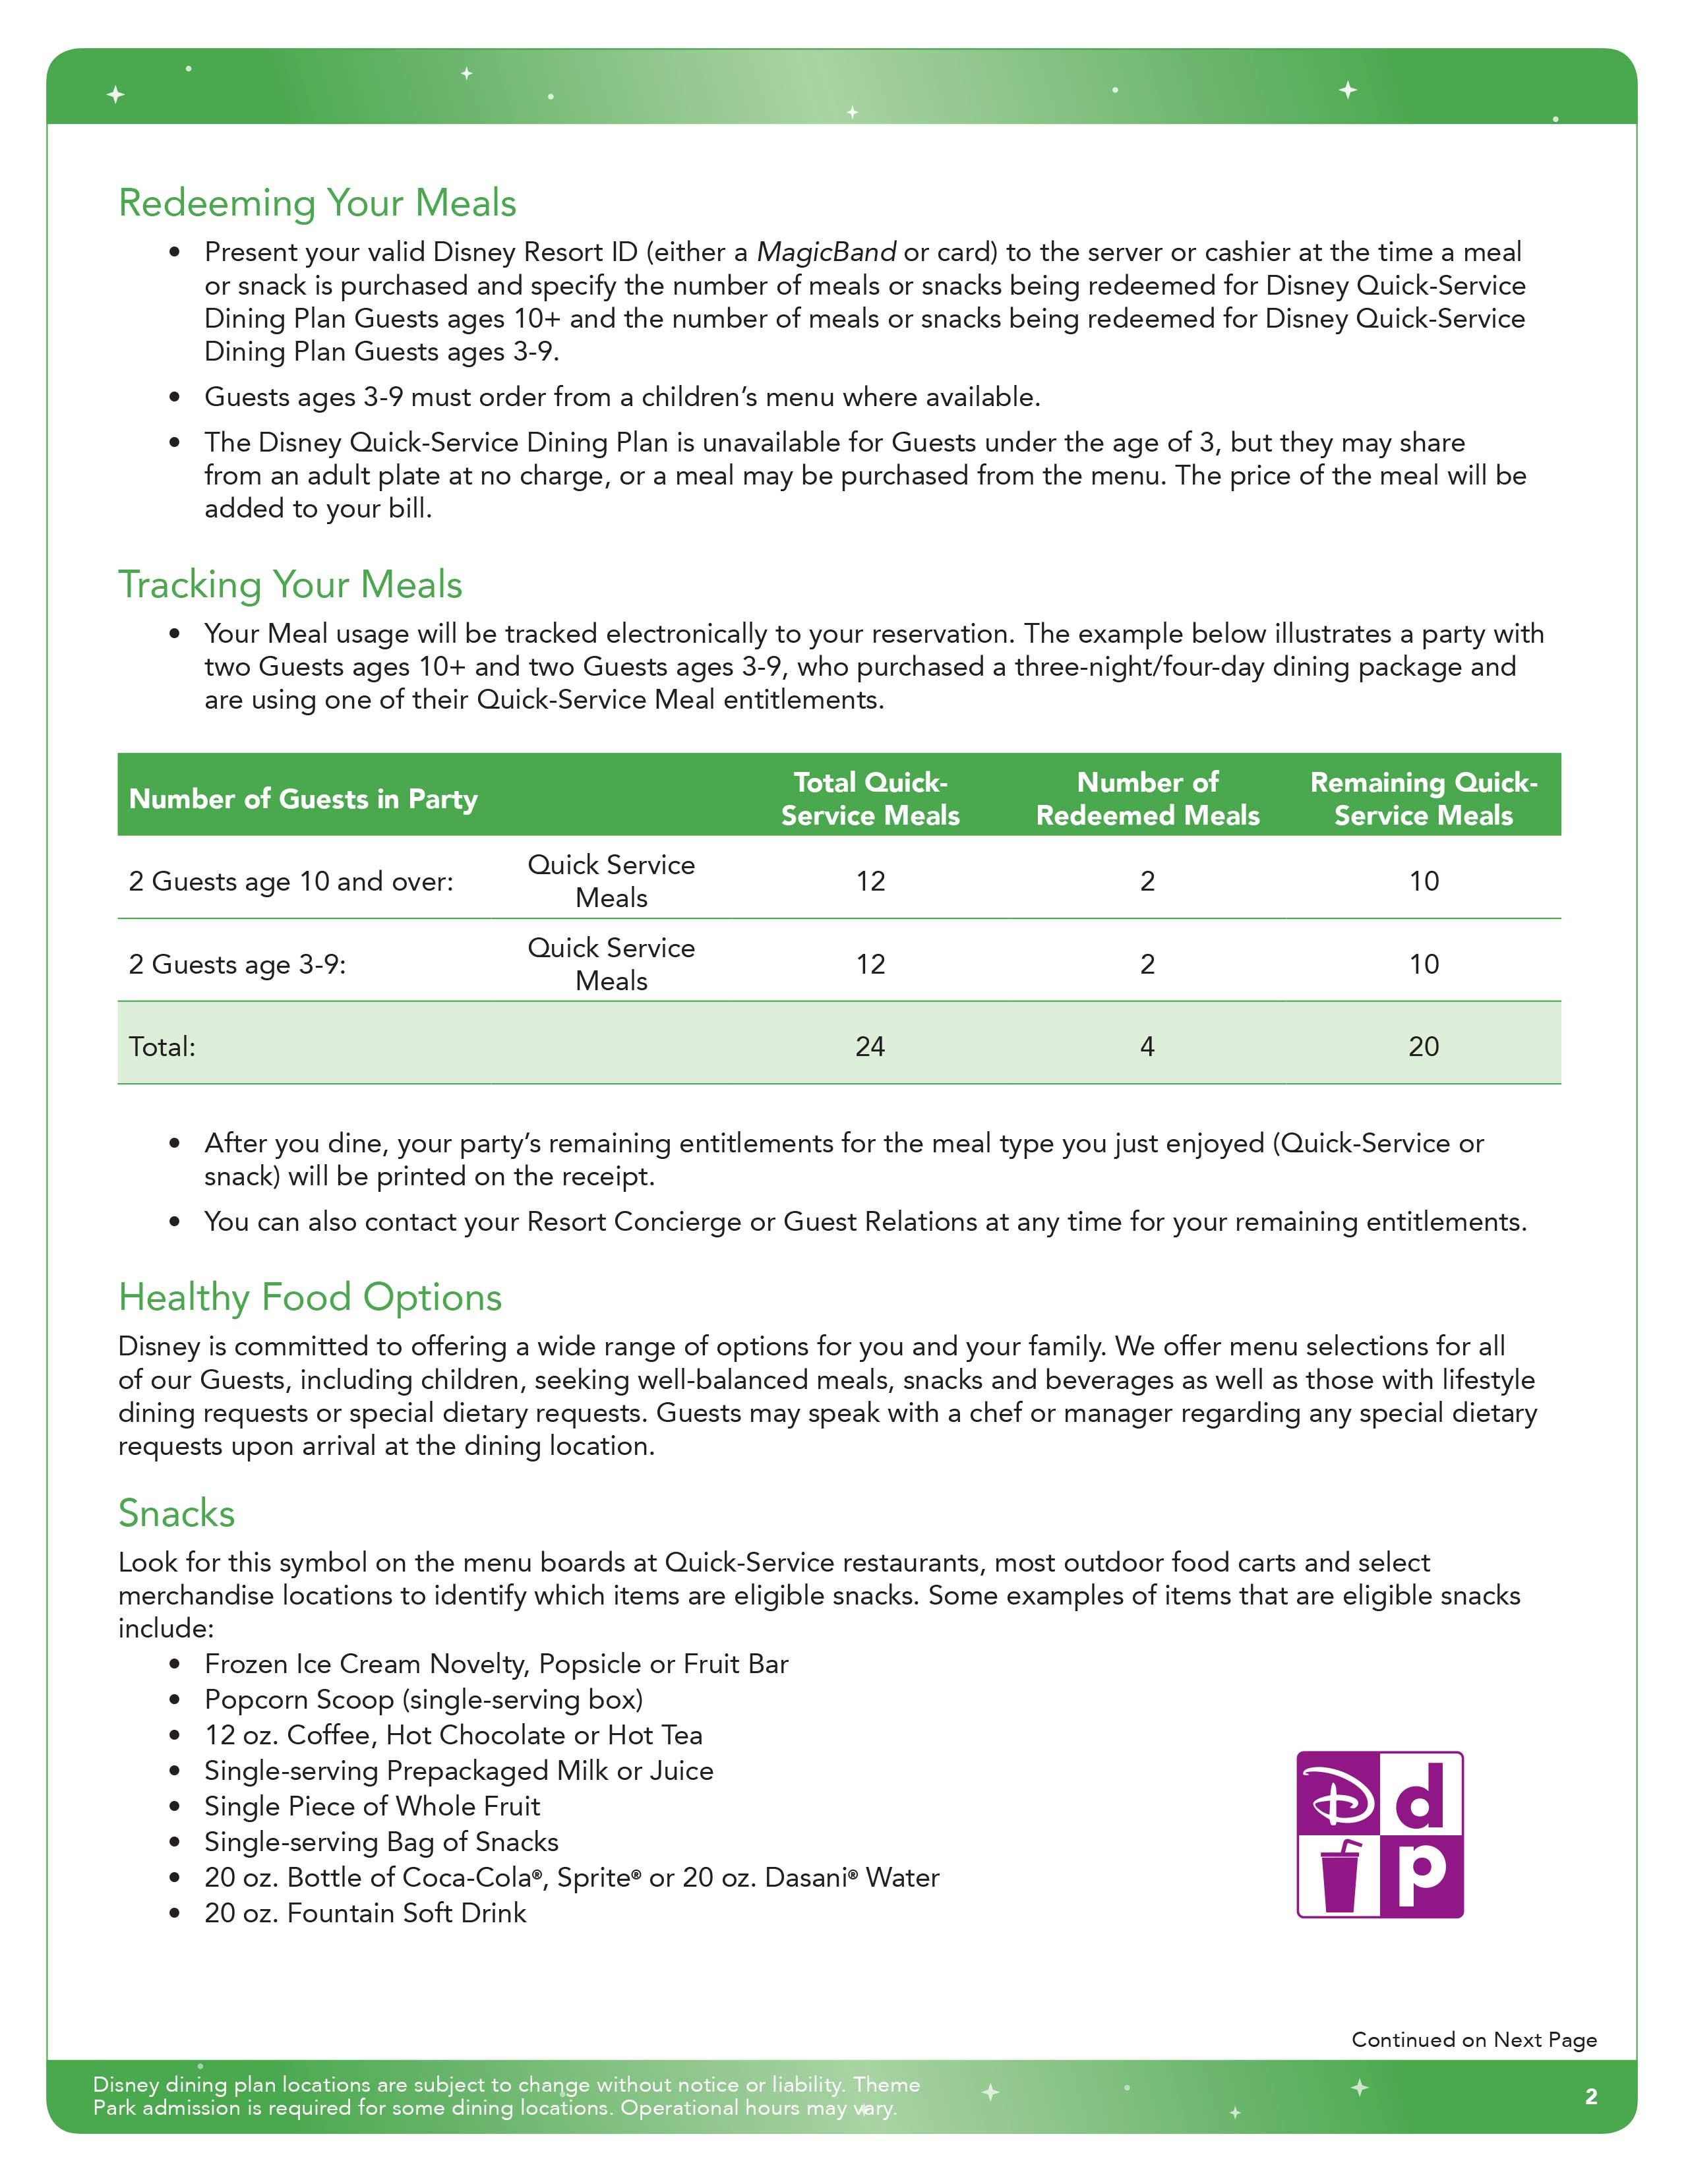 jul 10 2017 2016 disney quick service dining plan brochure page 2